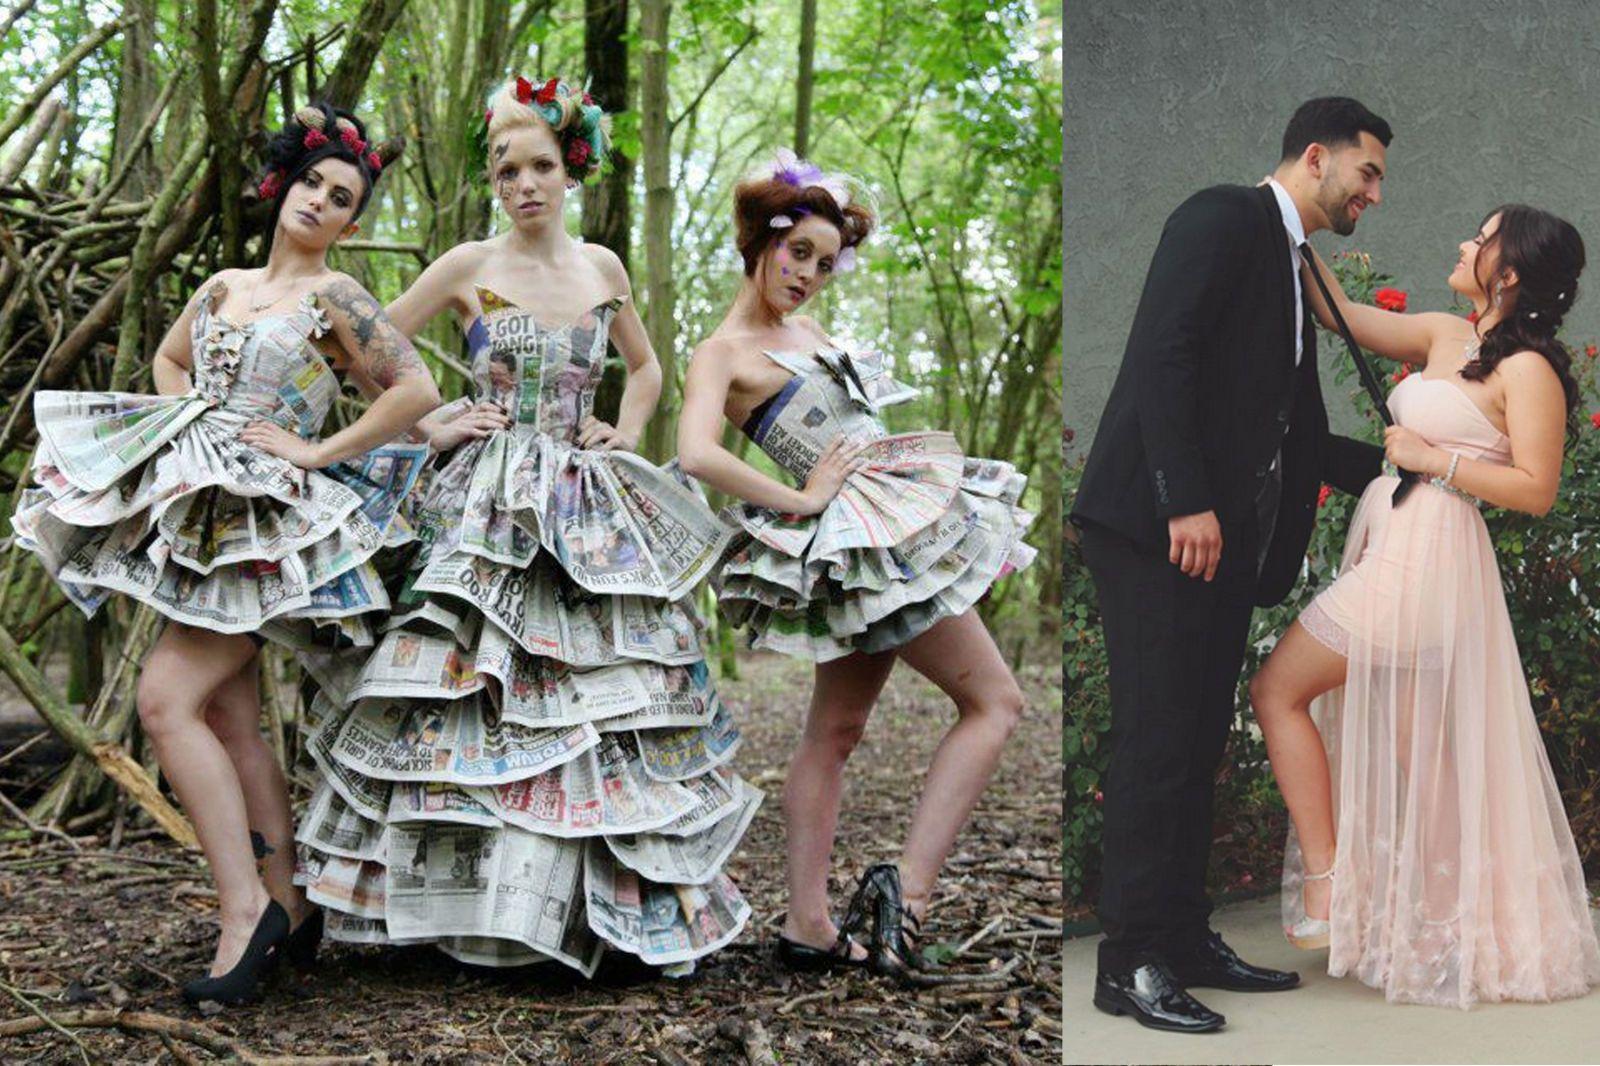 Großartig Recycled Prom Dresses Bilder - Brautkleider Ideen ...